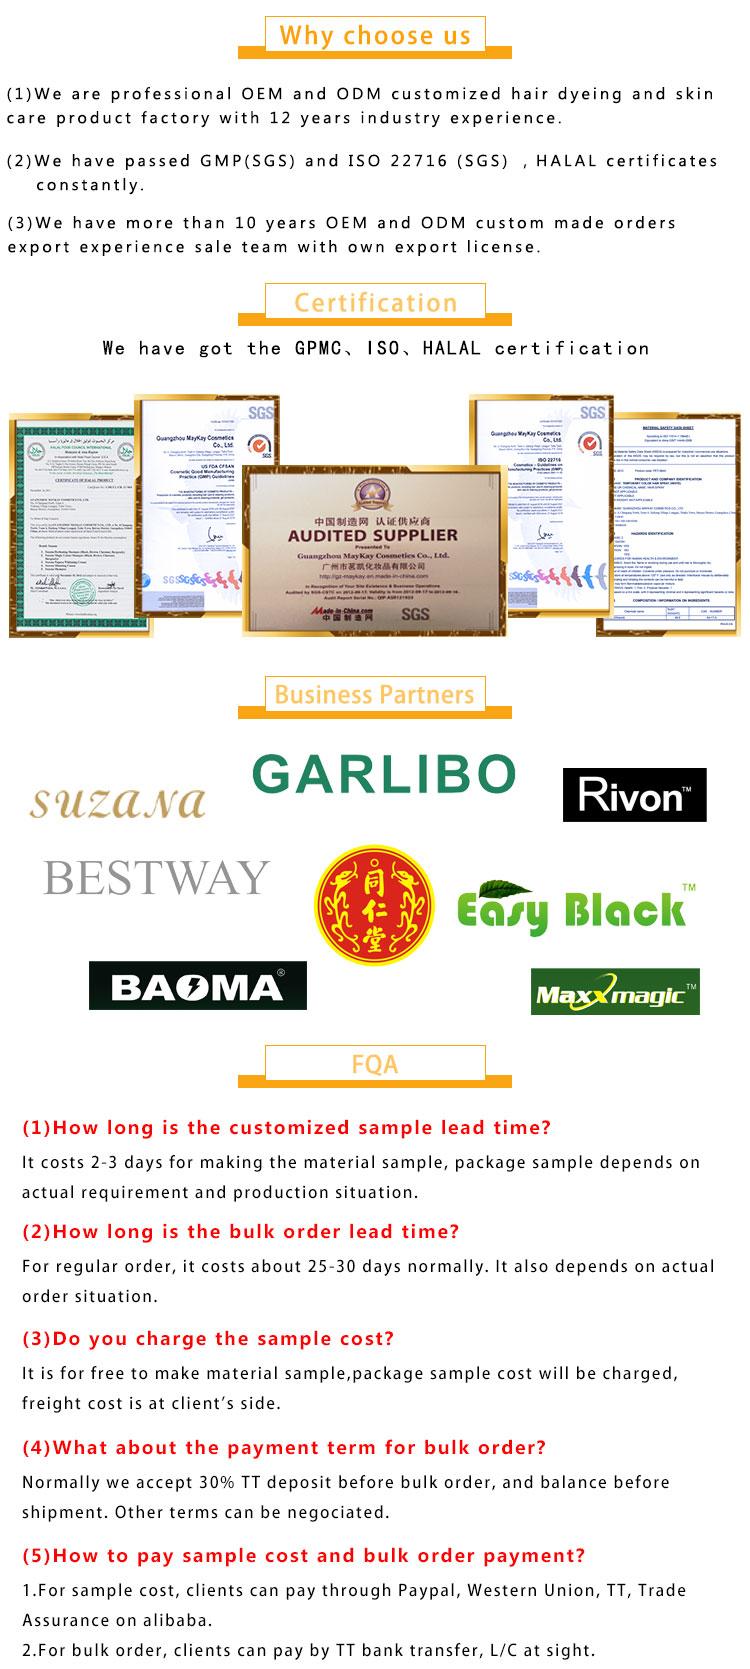 GMP ISO รับรองง่ายและสะดวก 100 ml Argan Oil Hair Growing Shining สเปรย์สำหรับผู้ใหญ่ rose gold hair dye